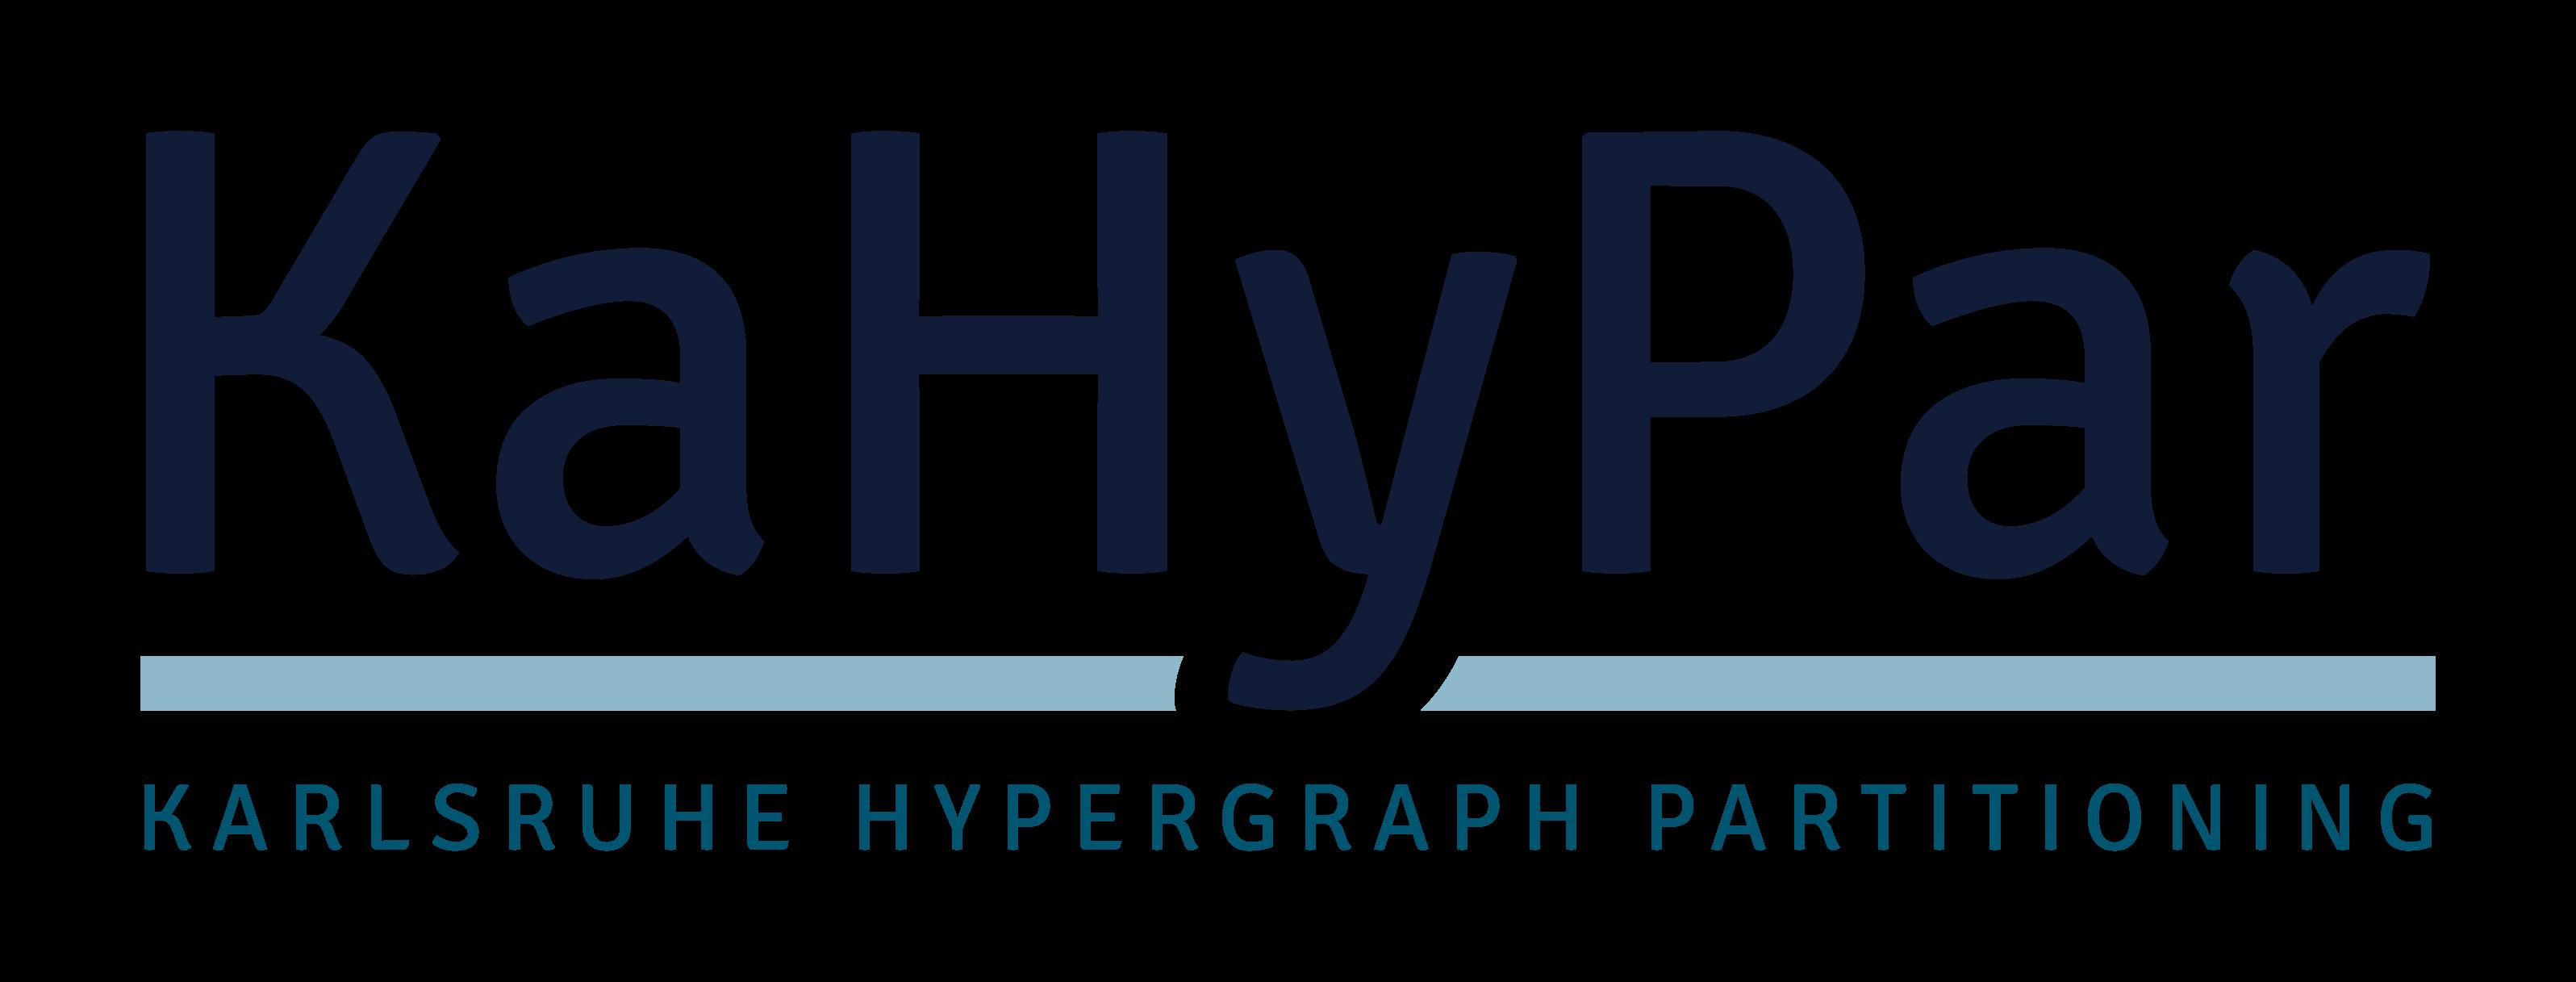 KaHyPar - Karlsruhe Hypergraph Partitioning